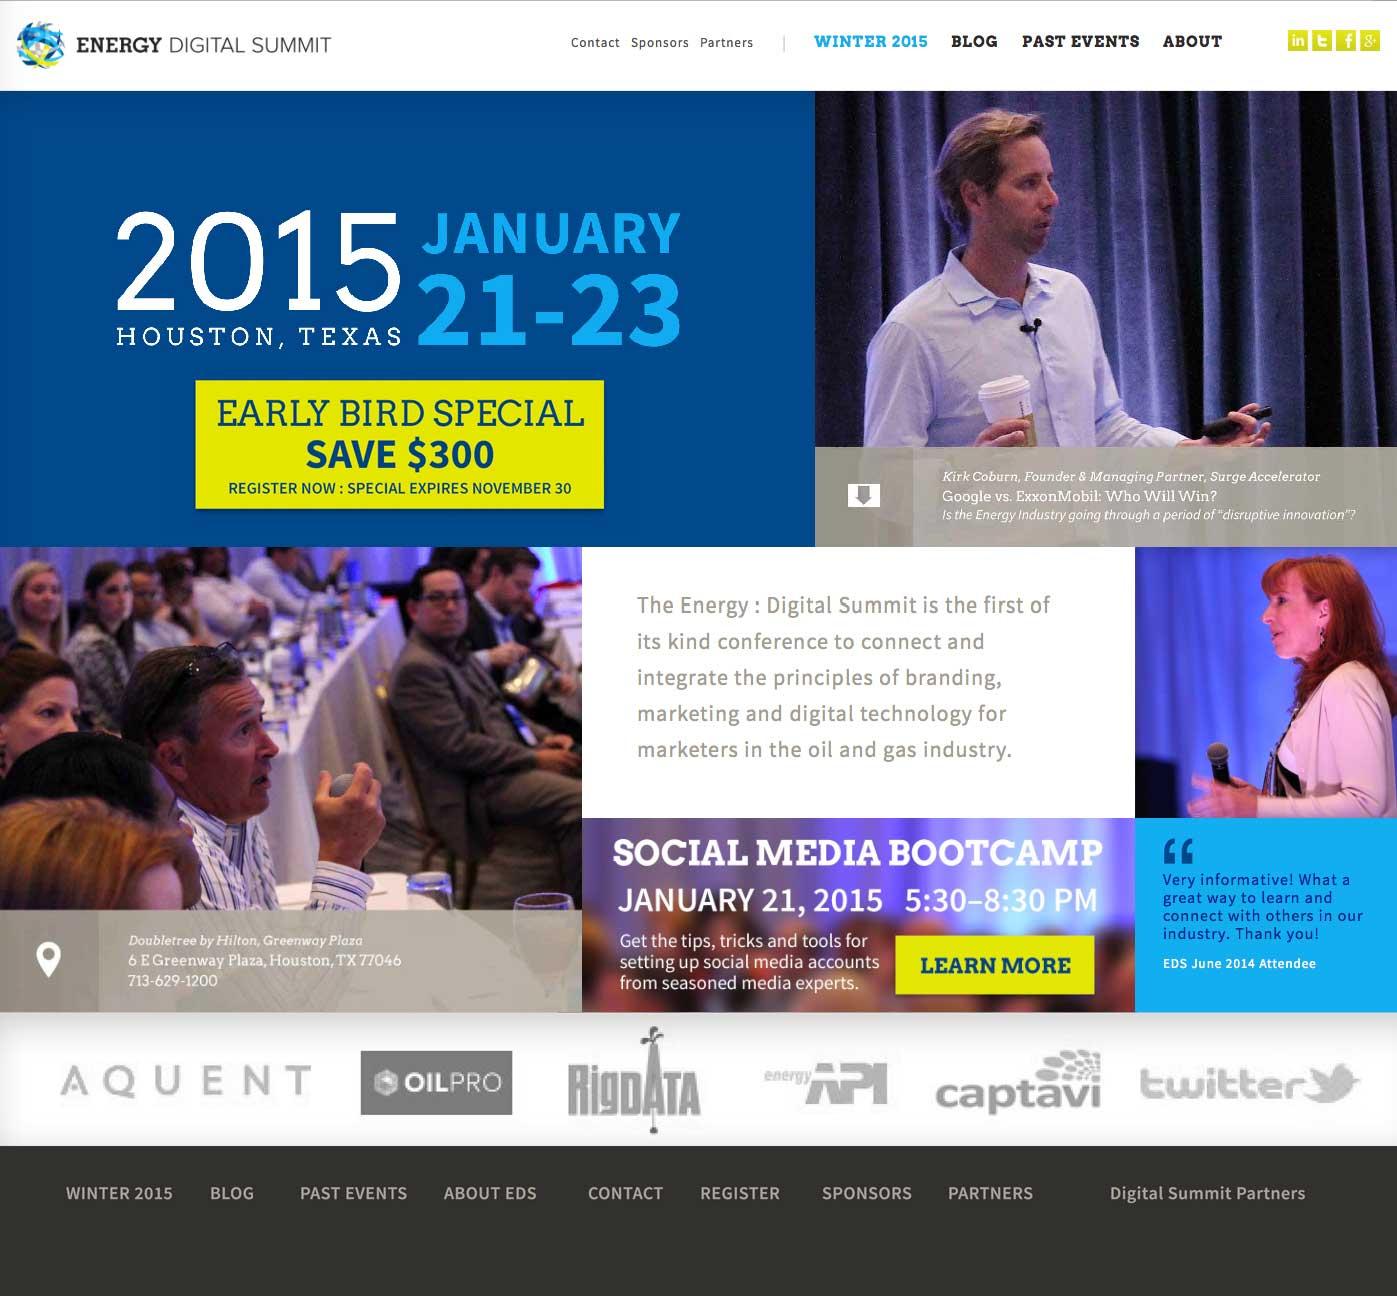 Energy Digital Summit website home page